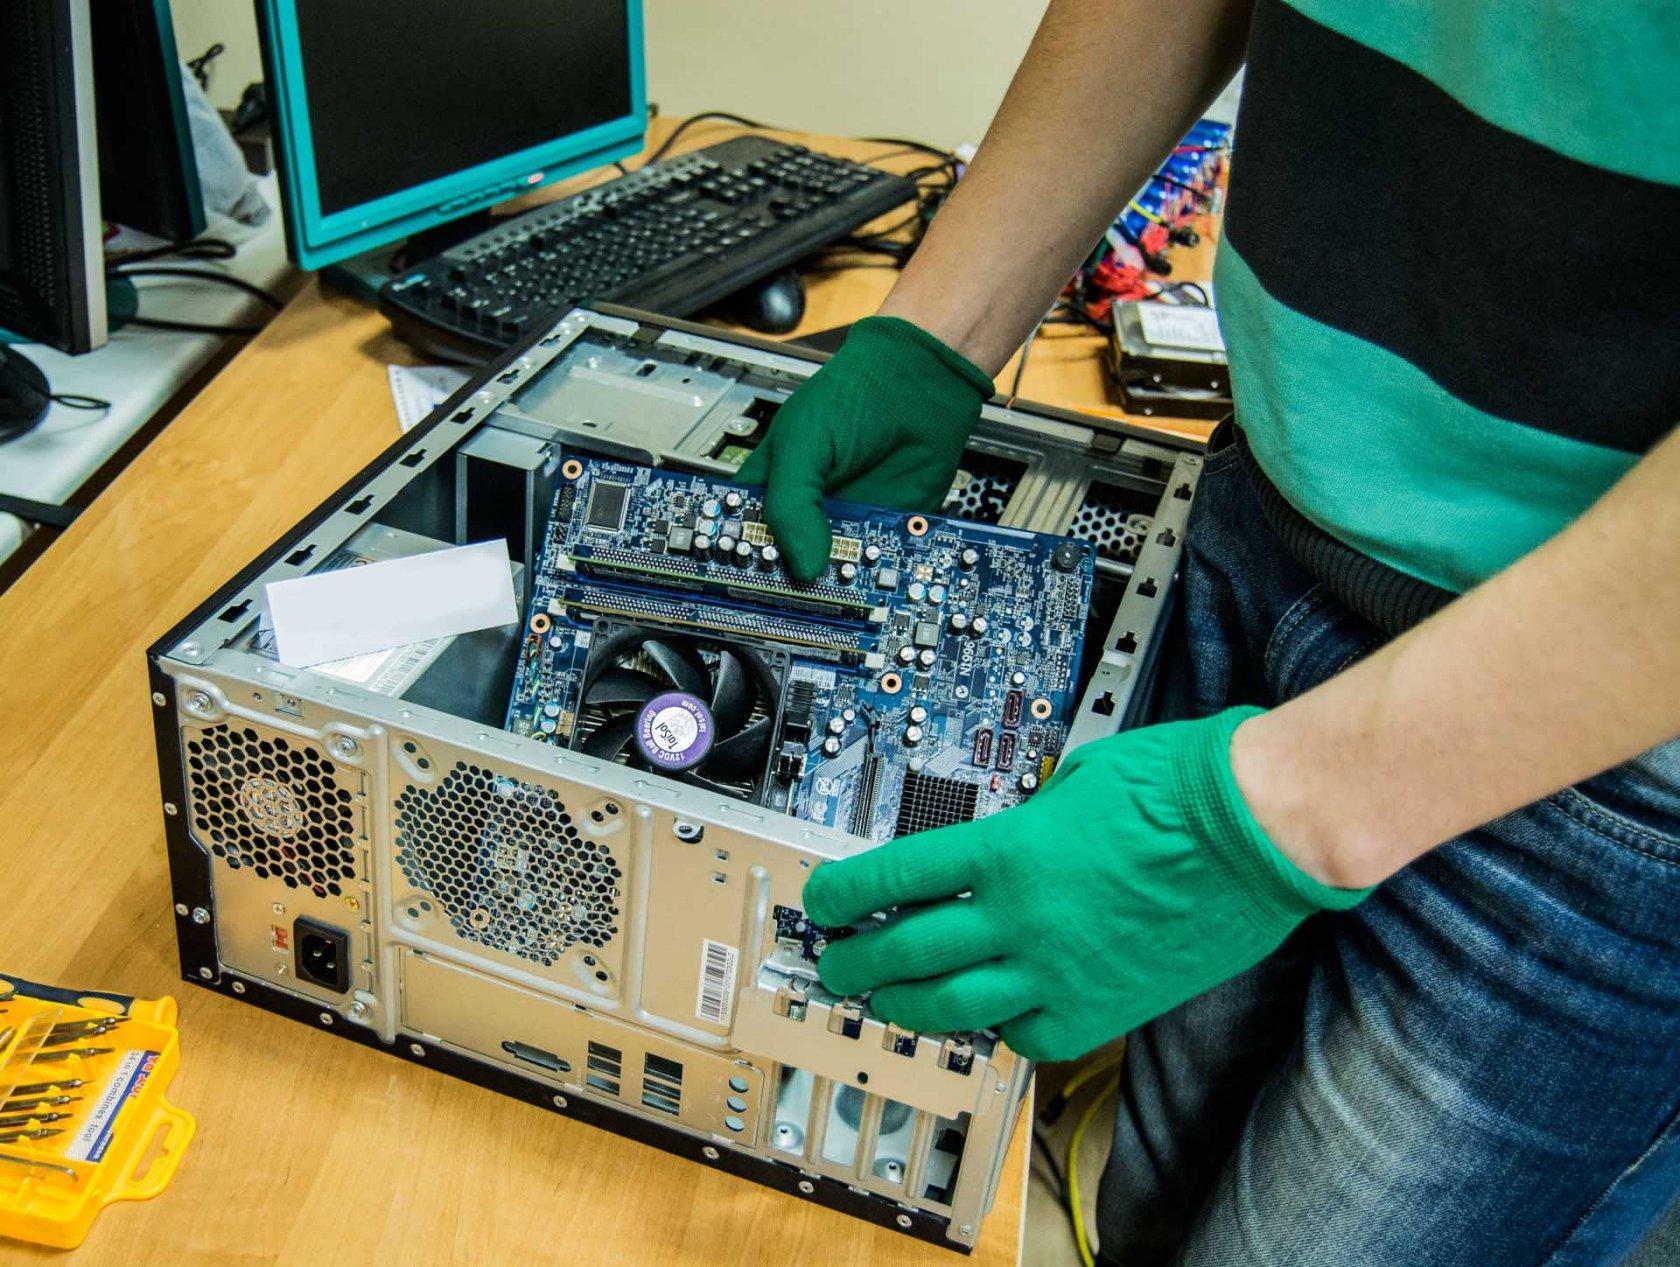 Ремонт и диагностика компьютера на дому